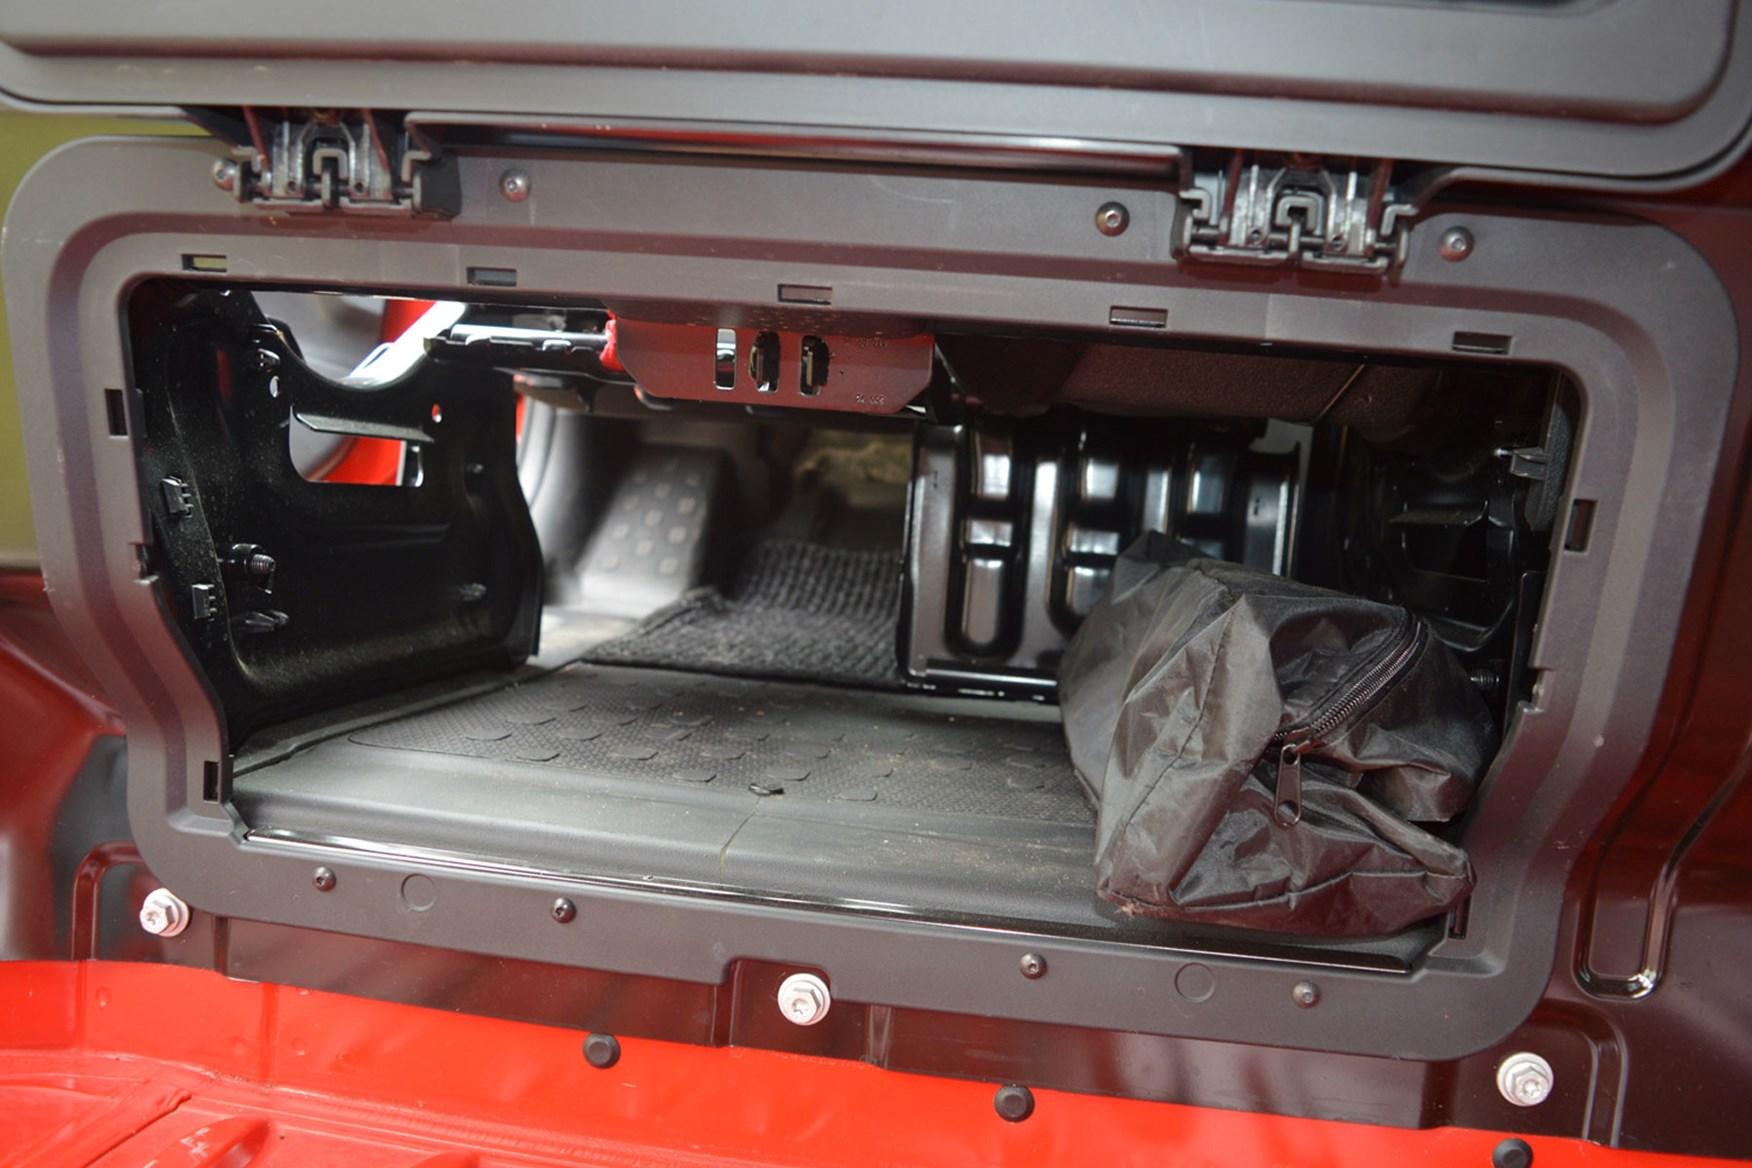 Vauxhall Vivaro Sportive EU5 review - bulkhead load-through hatch